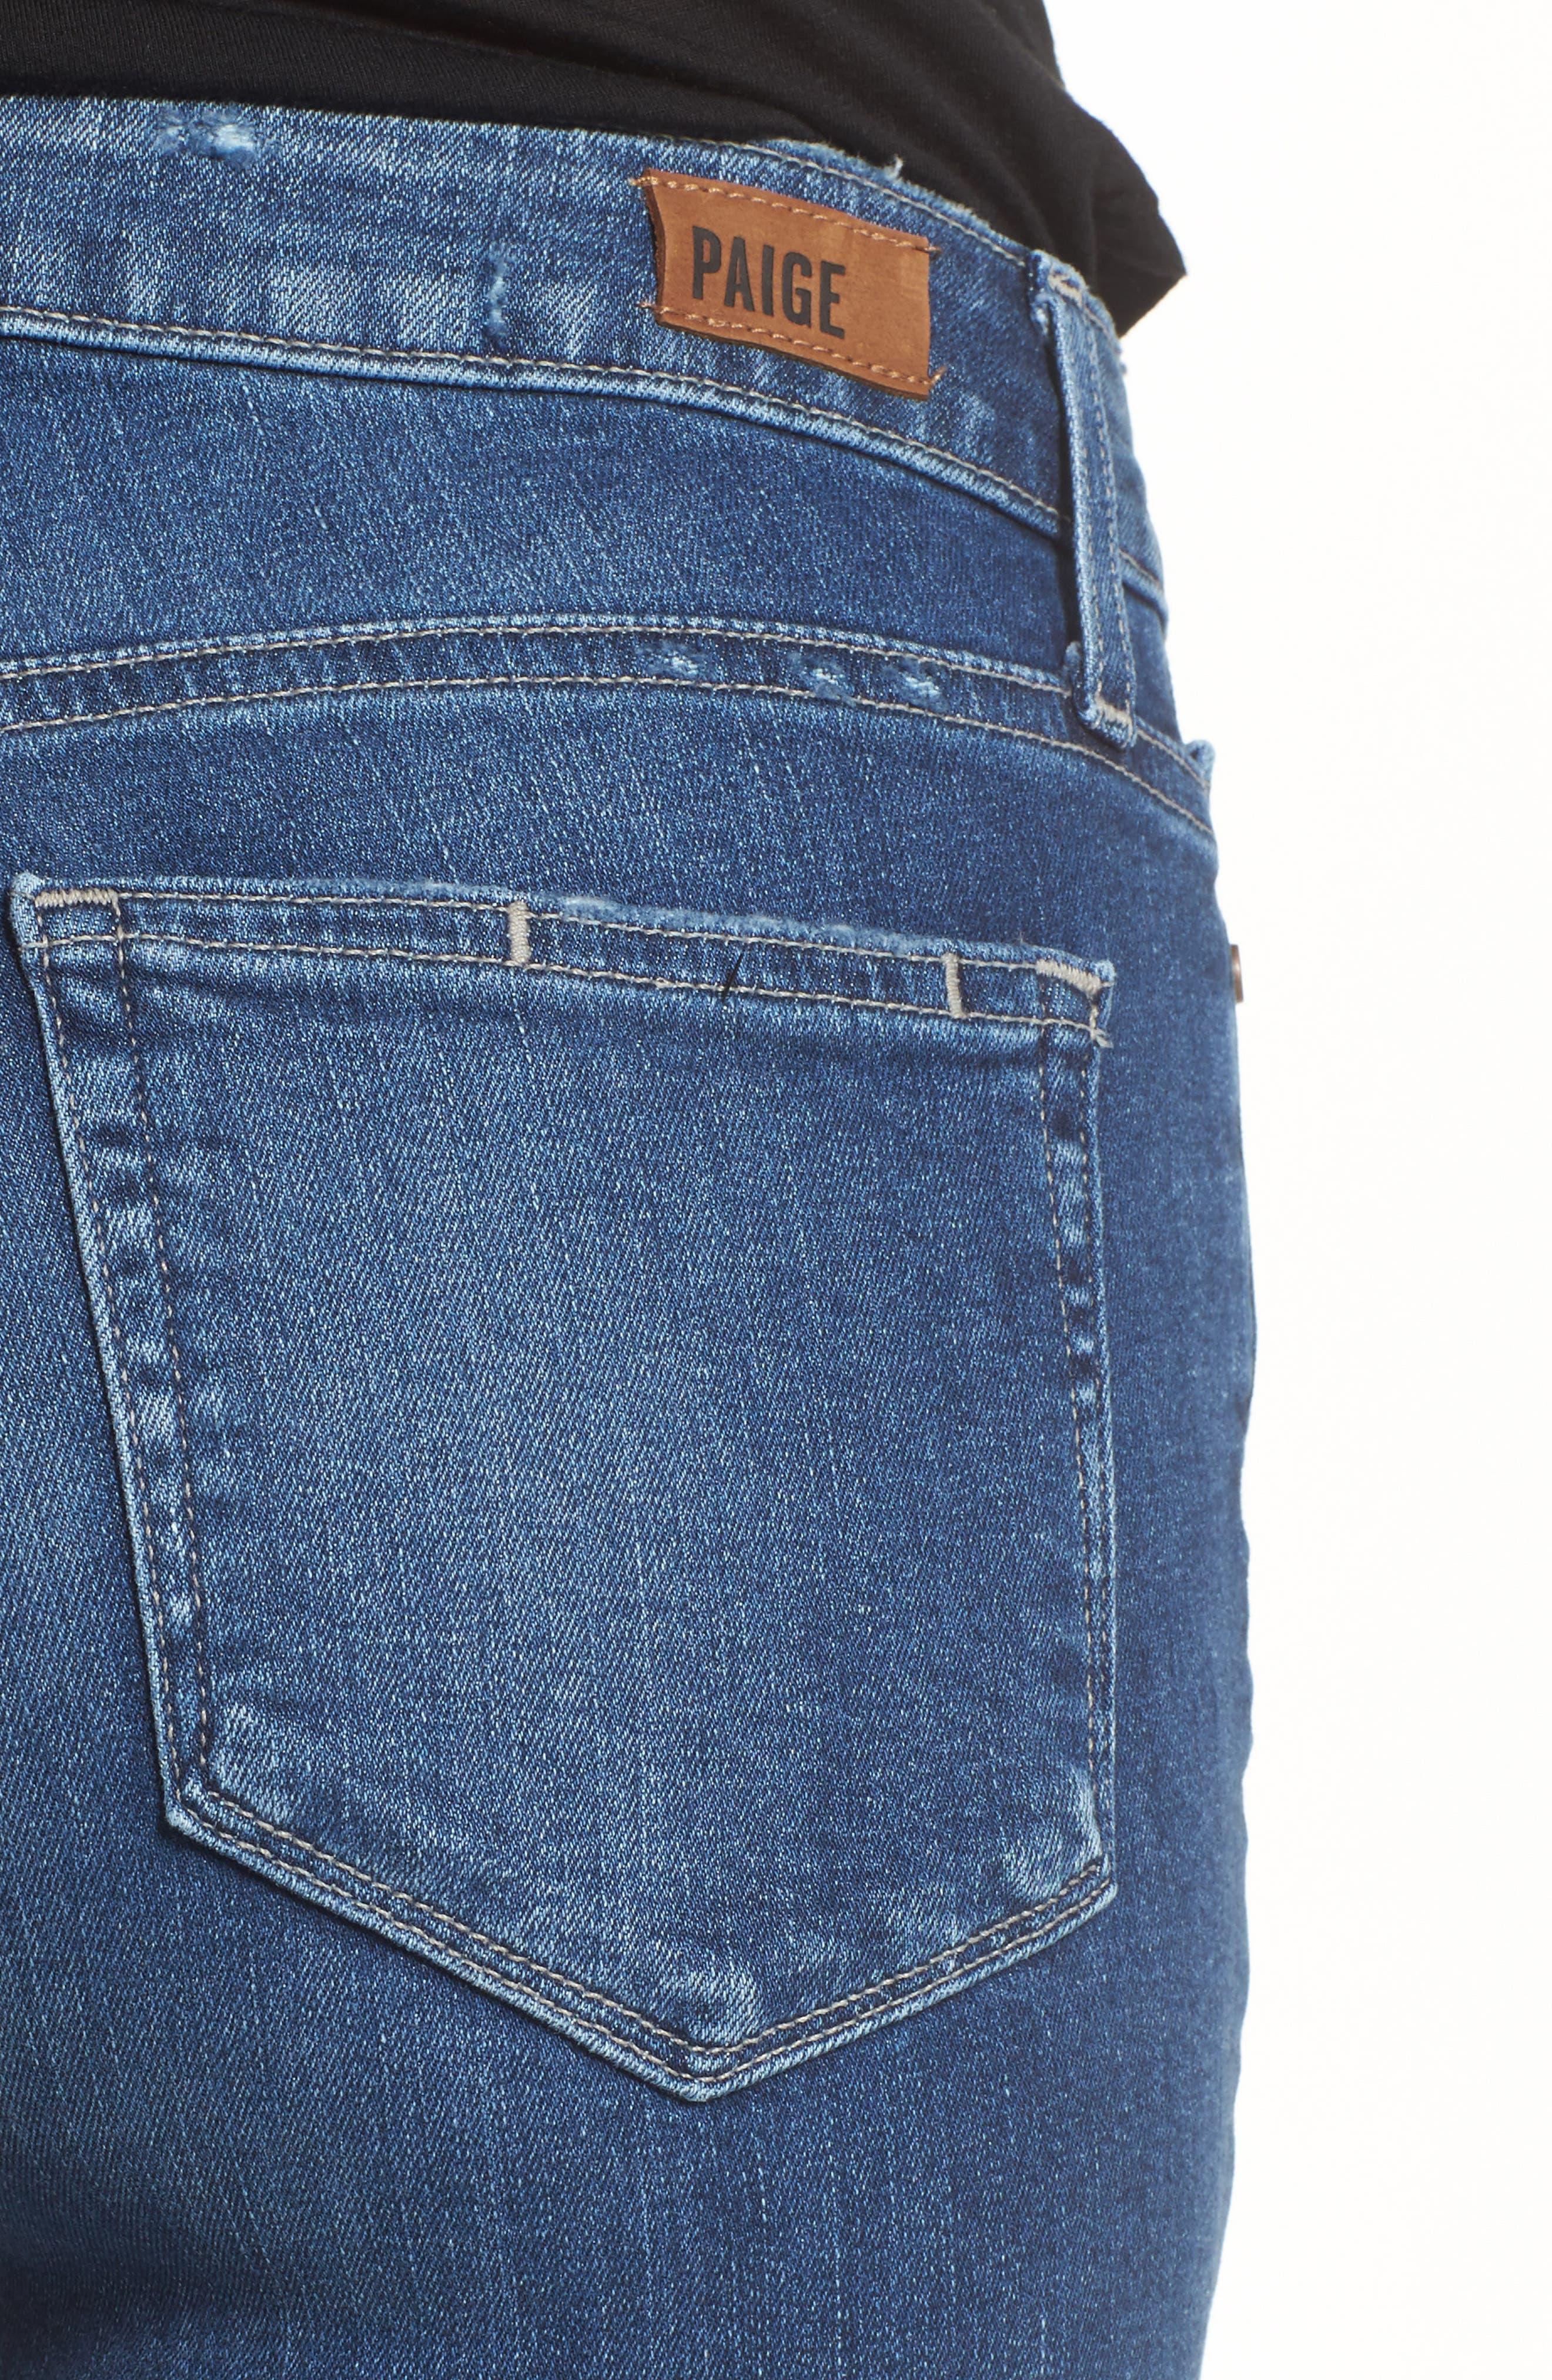 Transcend - Hoxton Ankle Straight Leg Jeans,                             Alternate thumbnail 4, color,                             400